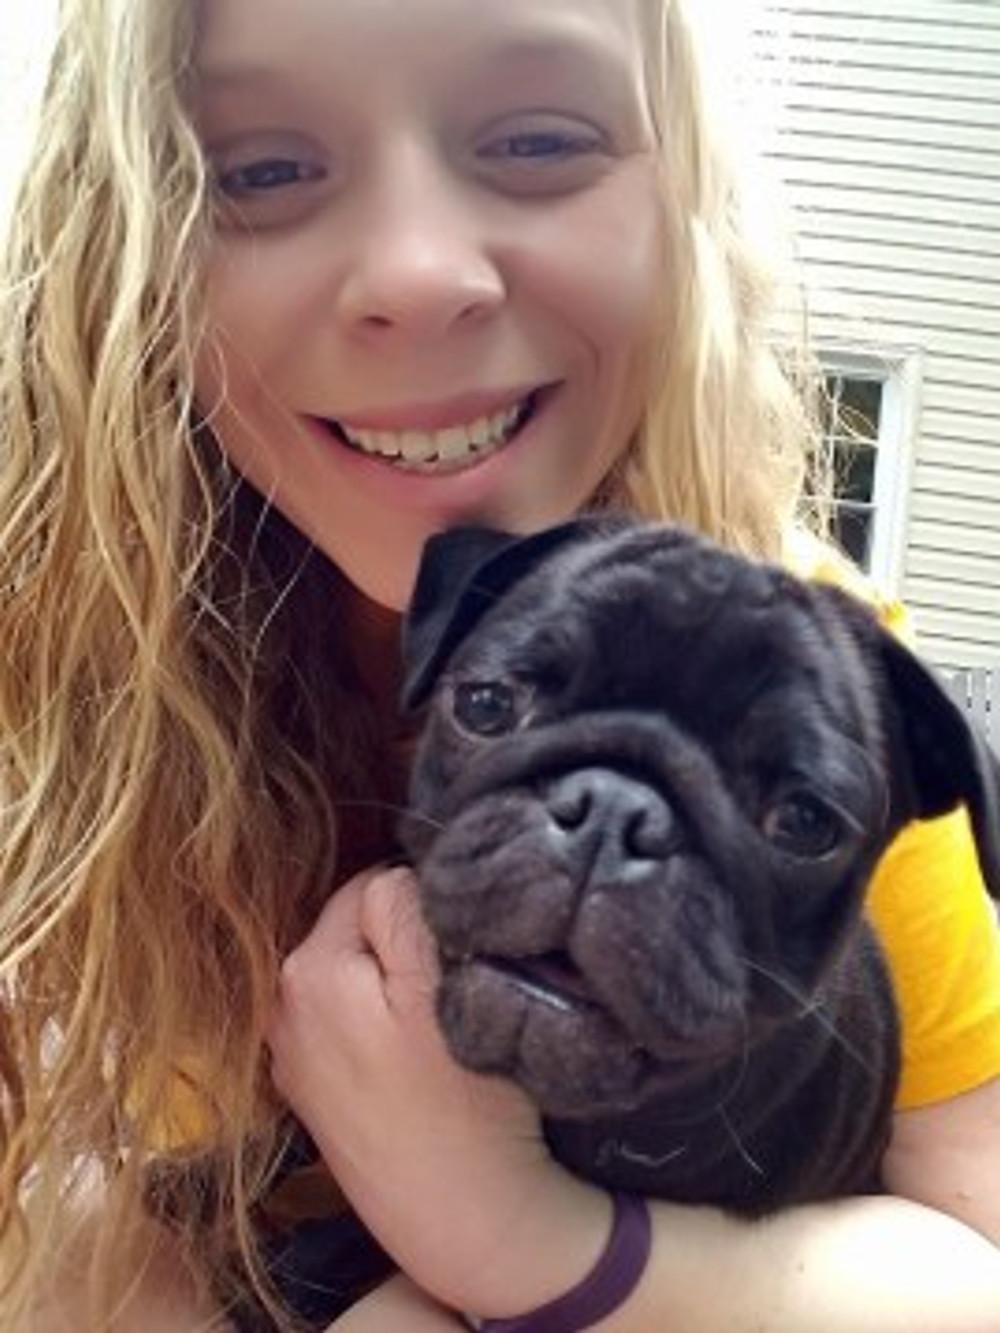 Selfie of Katie Mason with her black pug